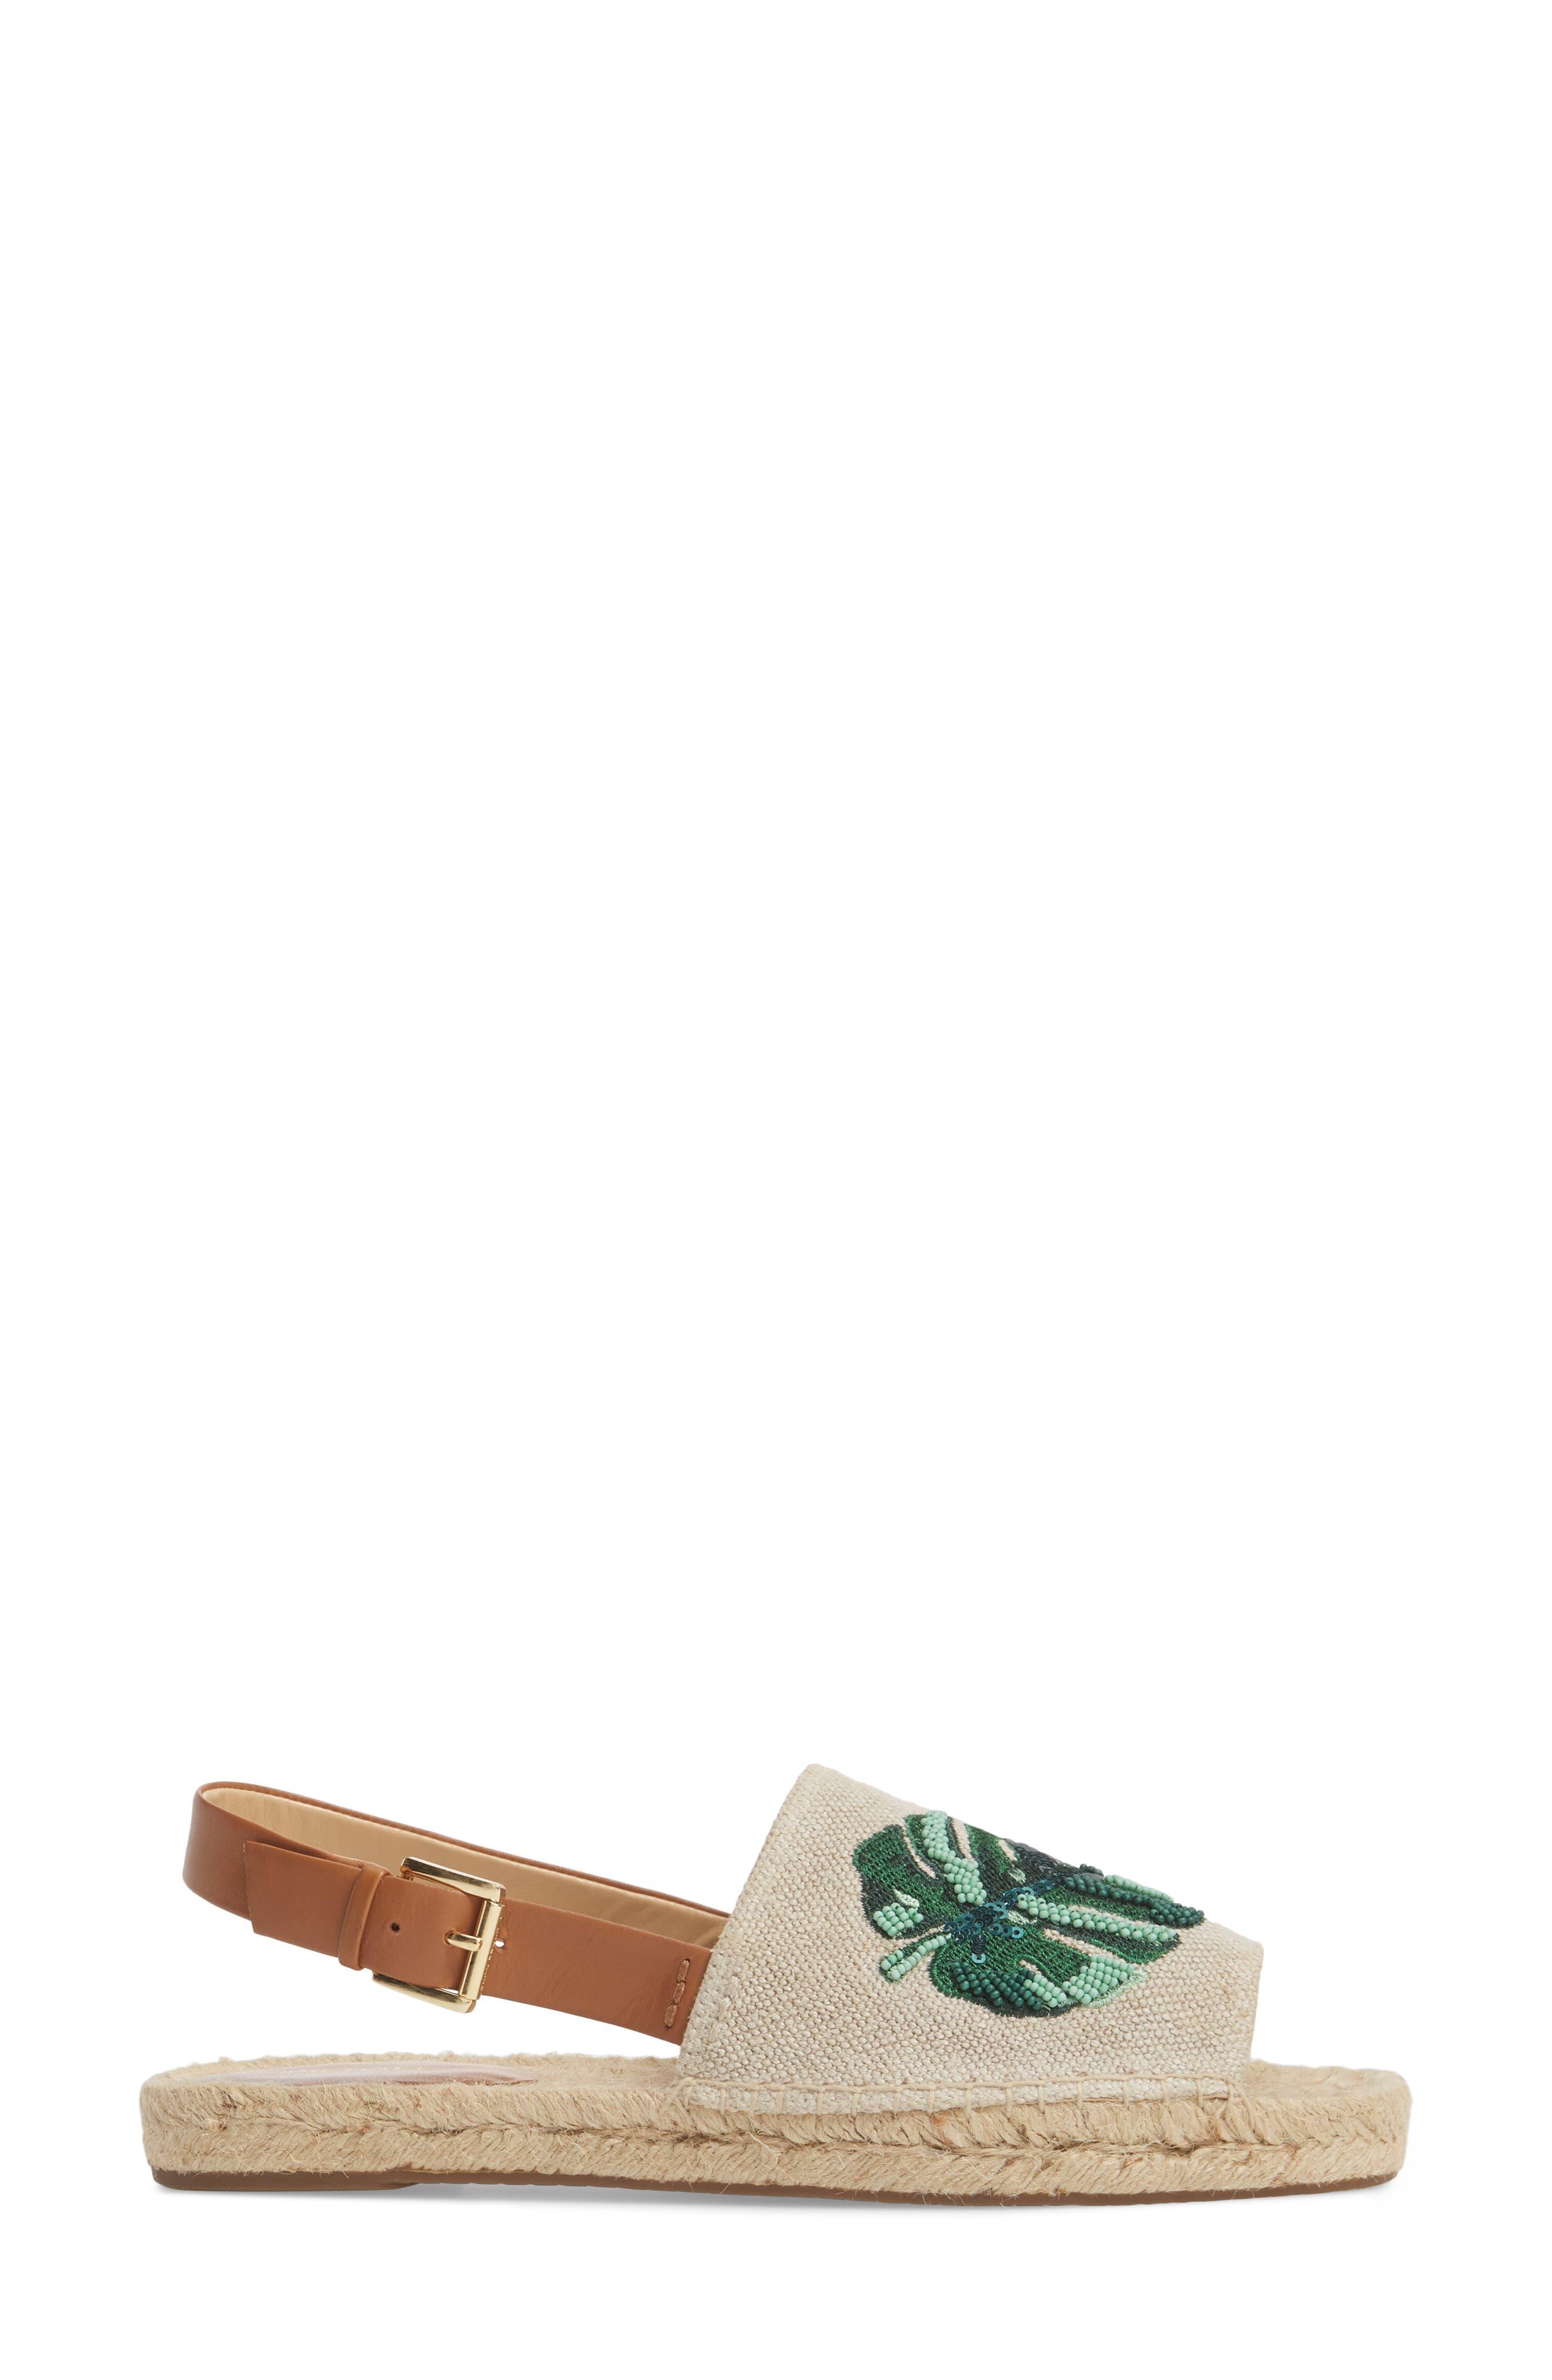 Fisher Espadrille Sandal,                             Alternate thumbnail 3, color,                             HEMP